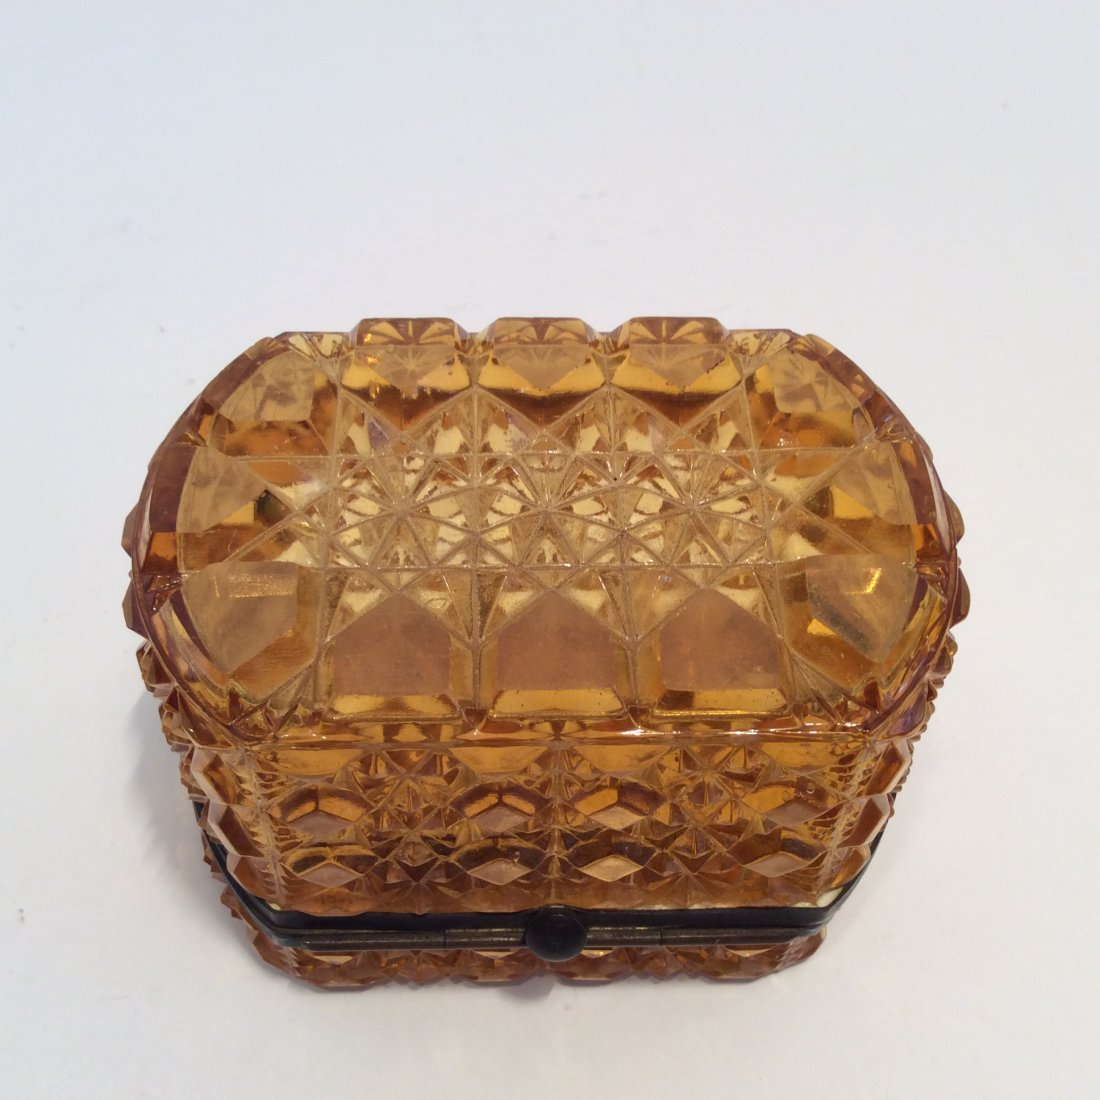 Antique Amber Glass French Trinket Box - 2